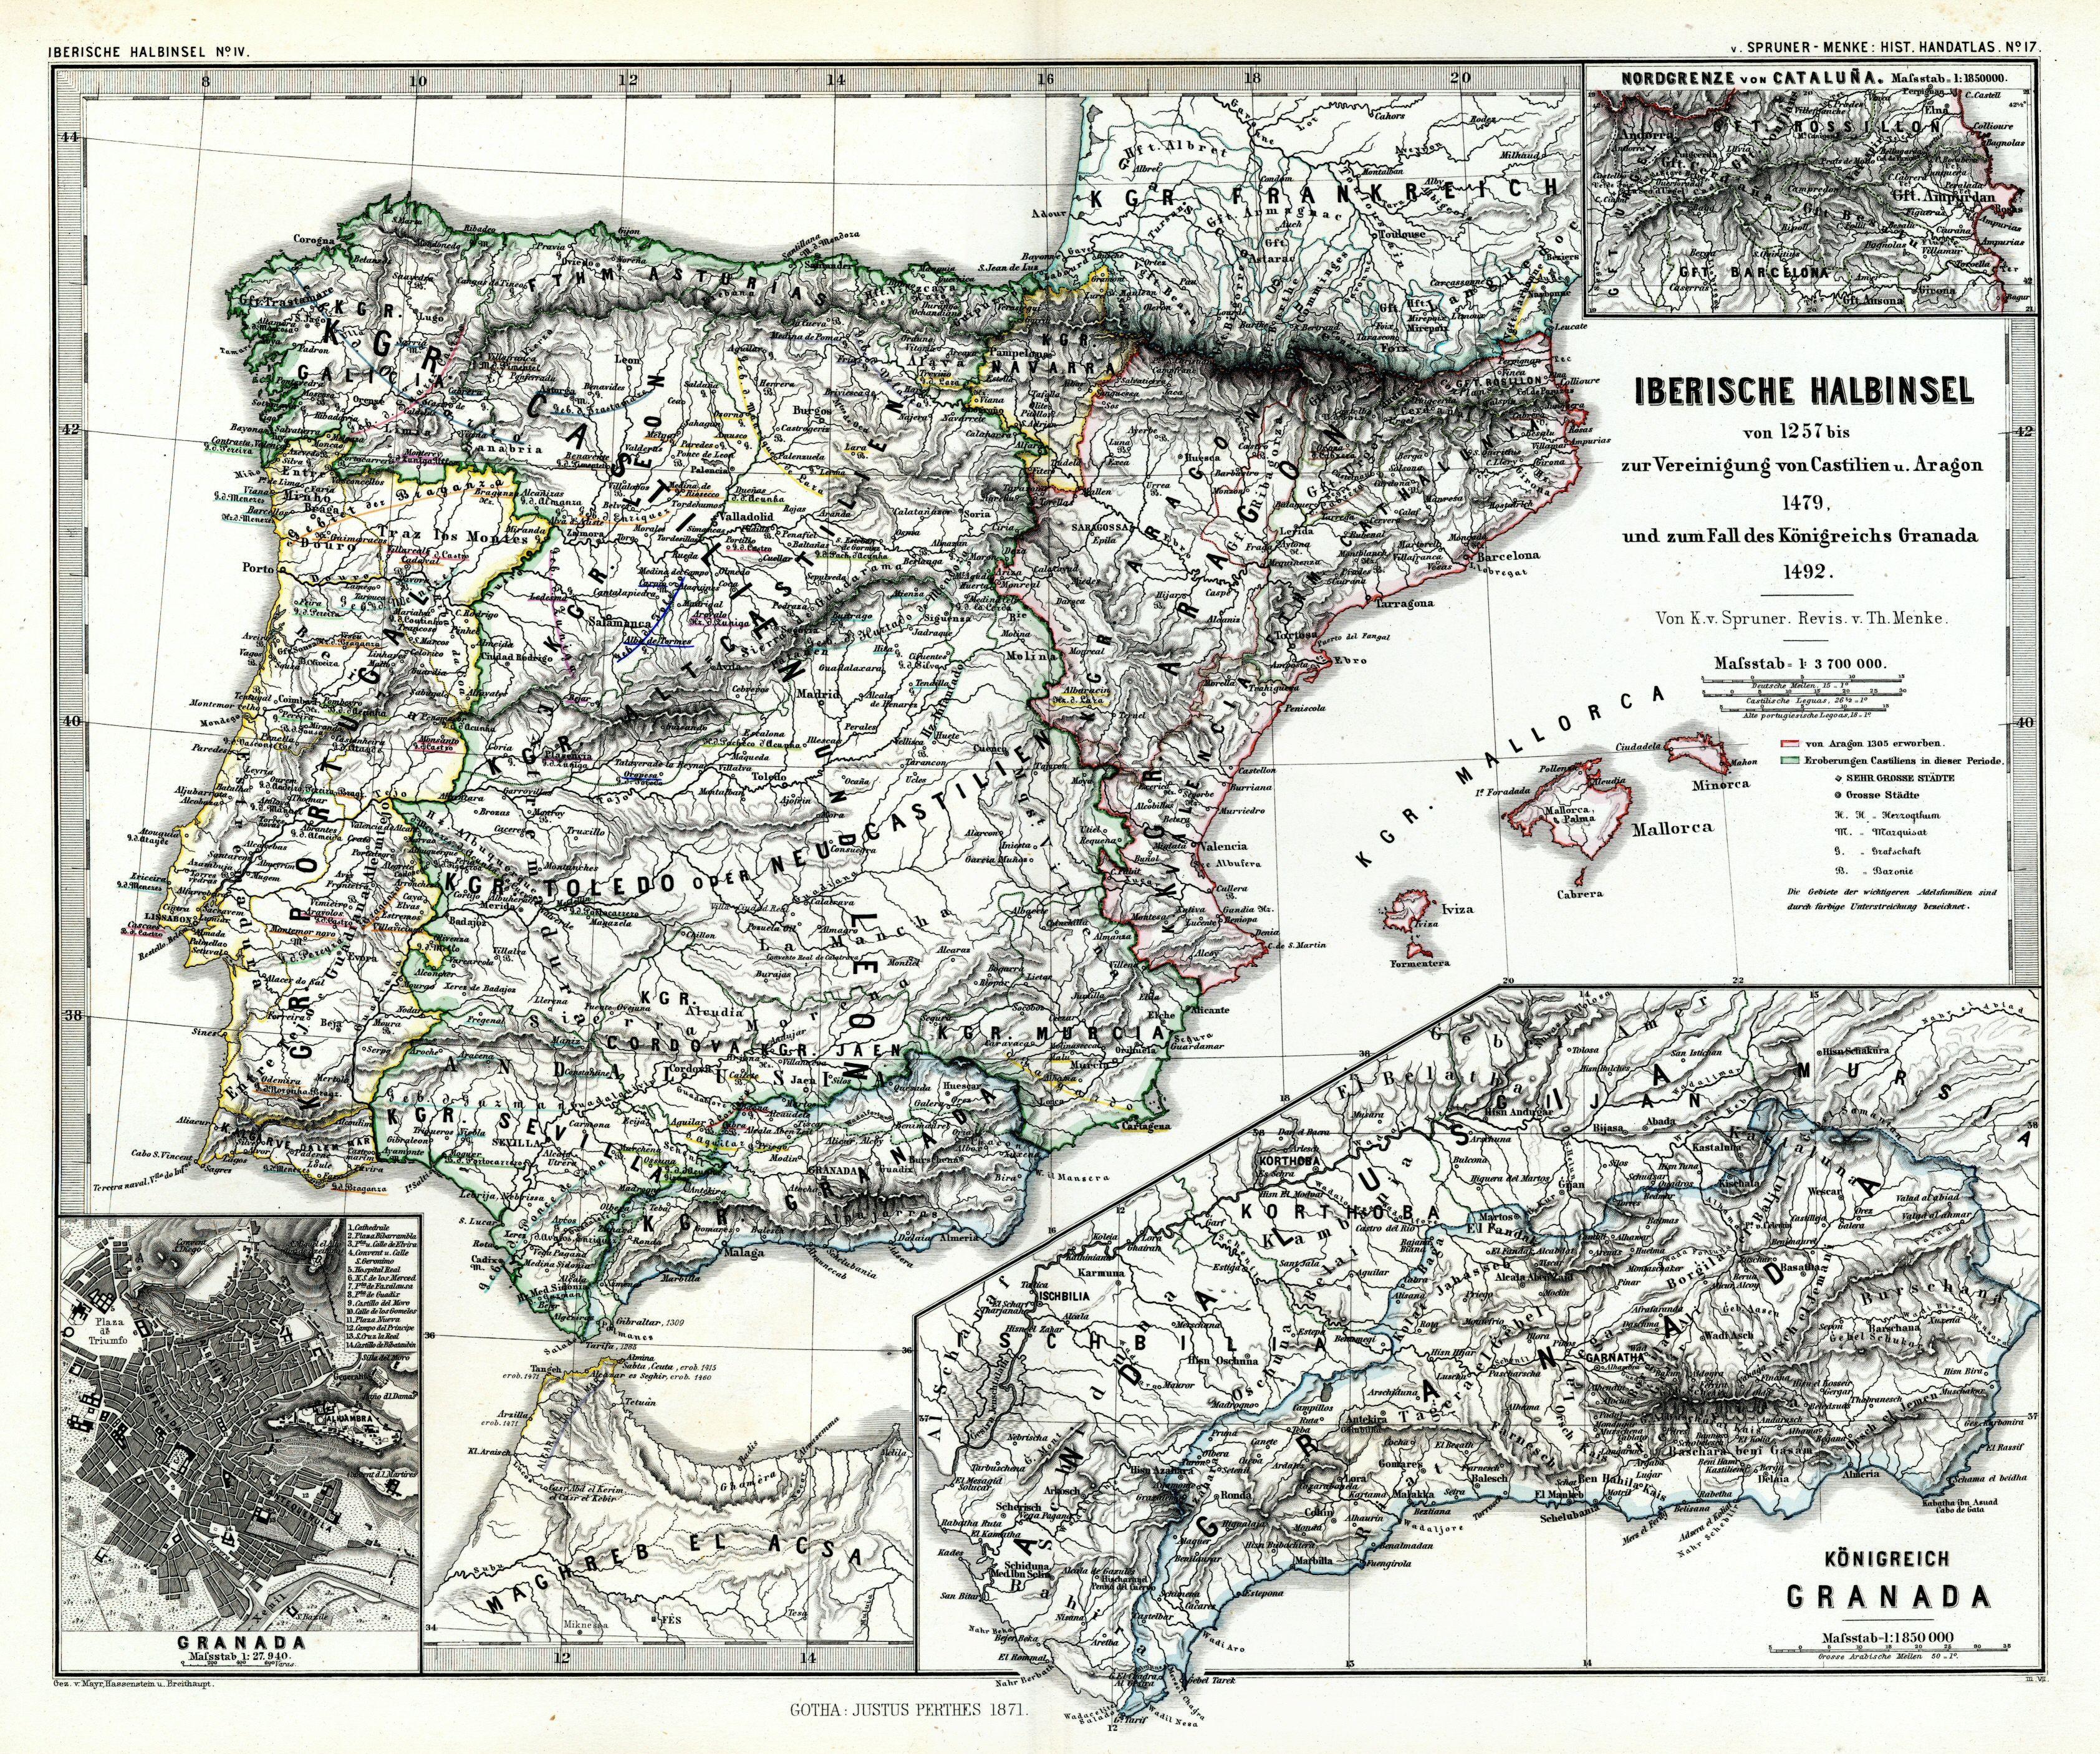 File:(Spruner-Menke, map 17) The Iberian peninsula 1257-1492